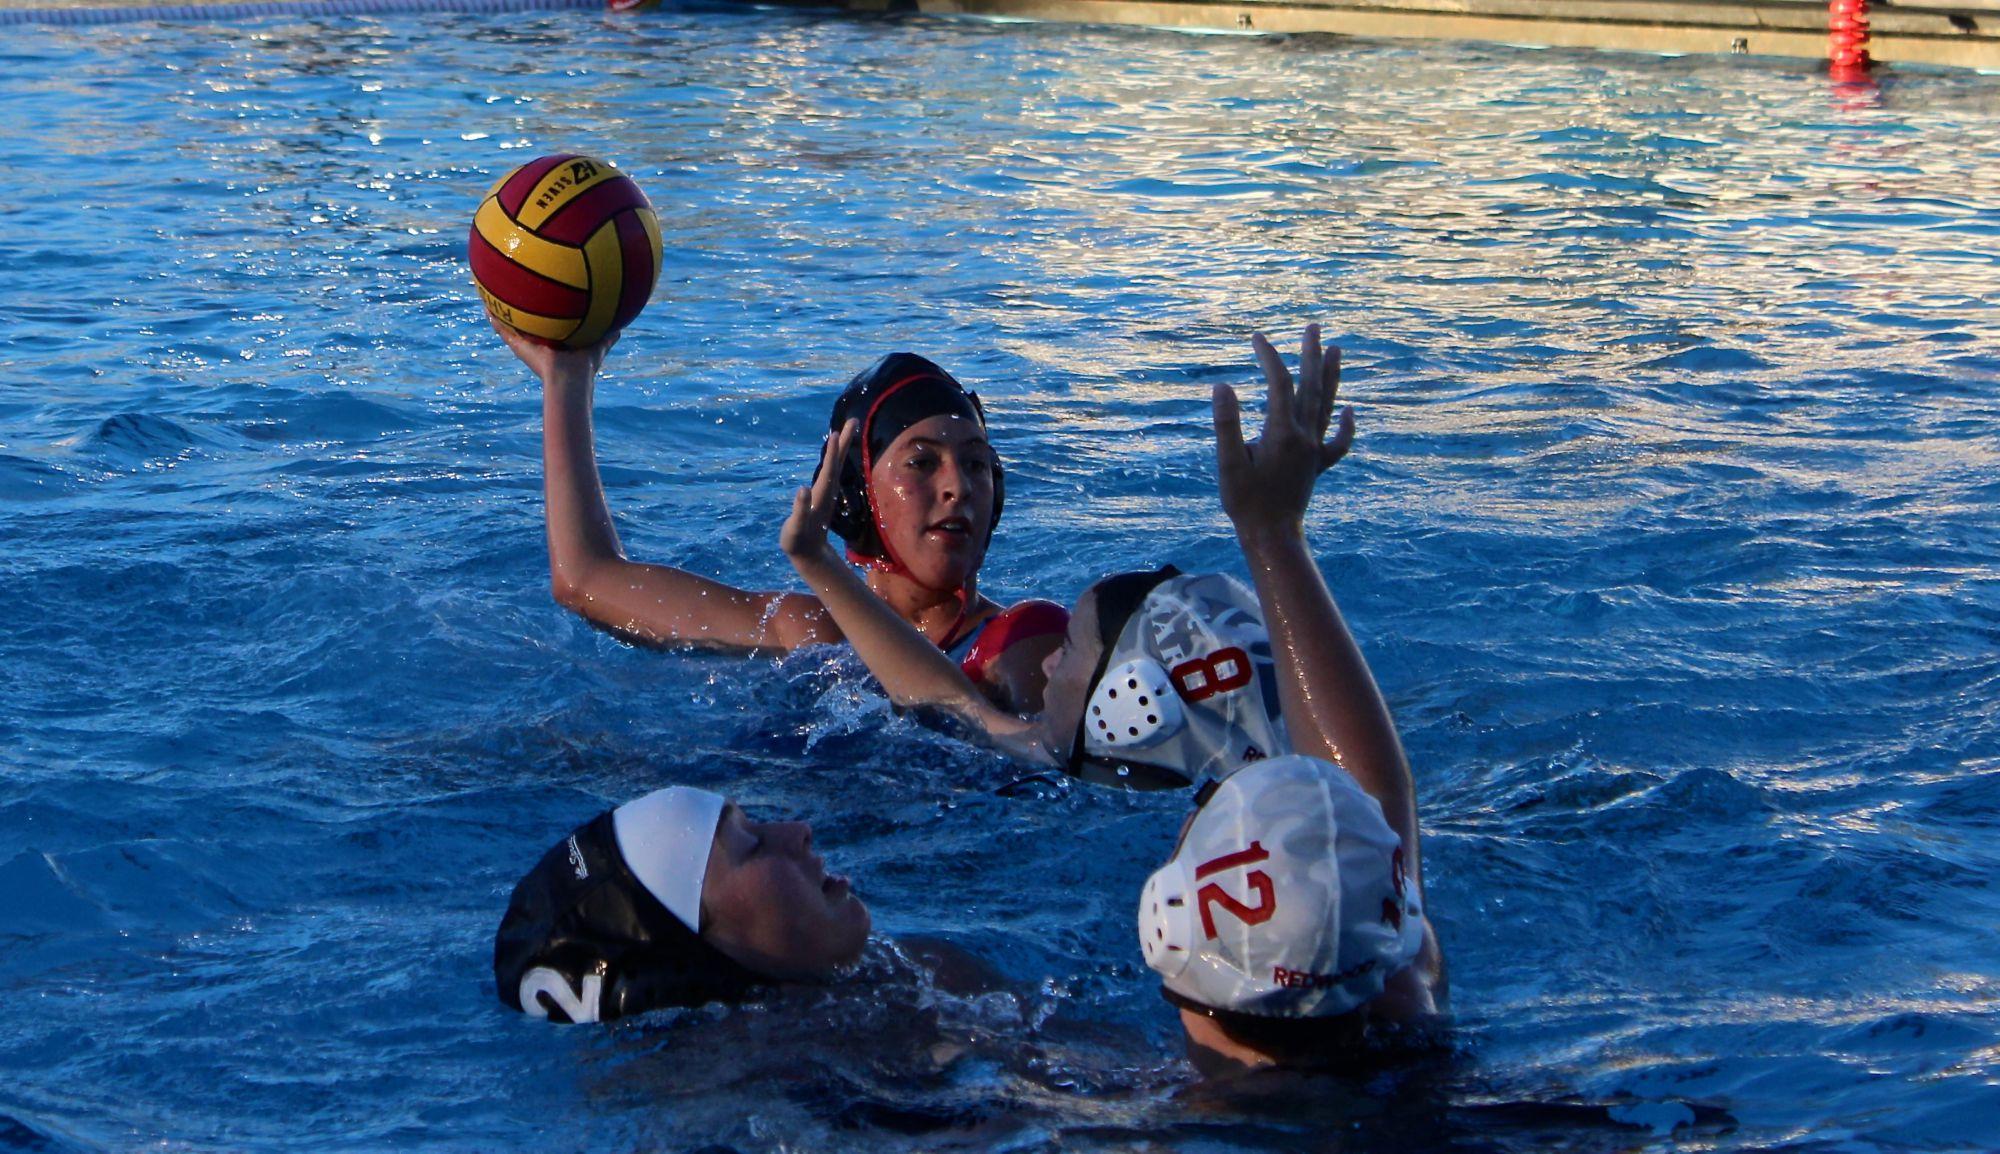 Girls' water polo starts fresh season with new members